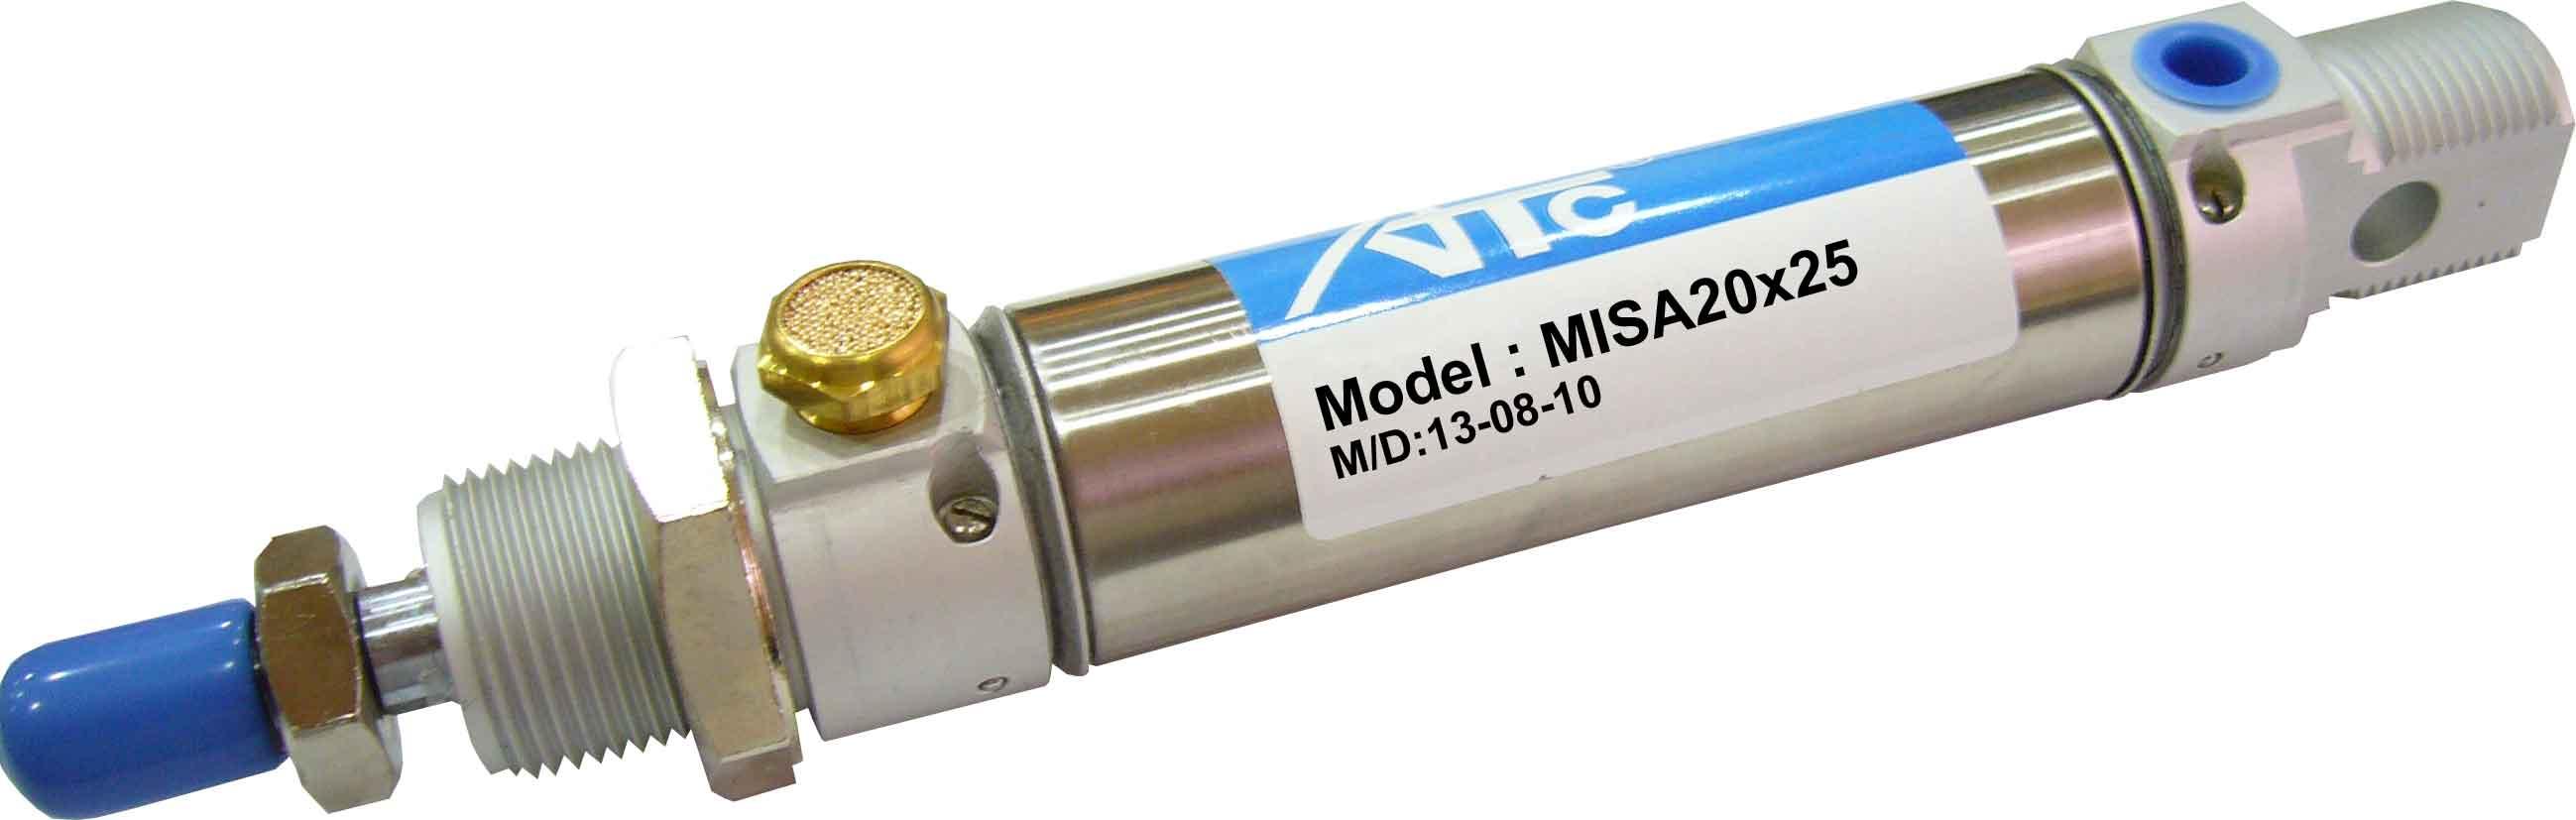 ISO6430 Stainless Steel Slim Cylinder (MISA MITA Series)